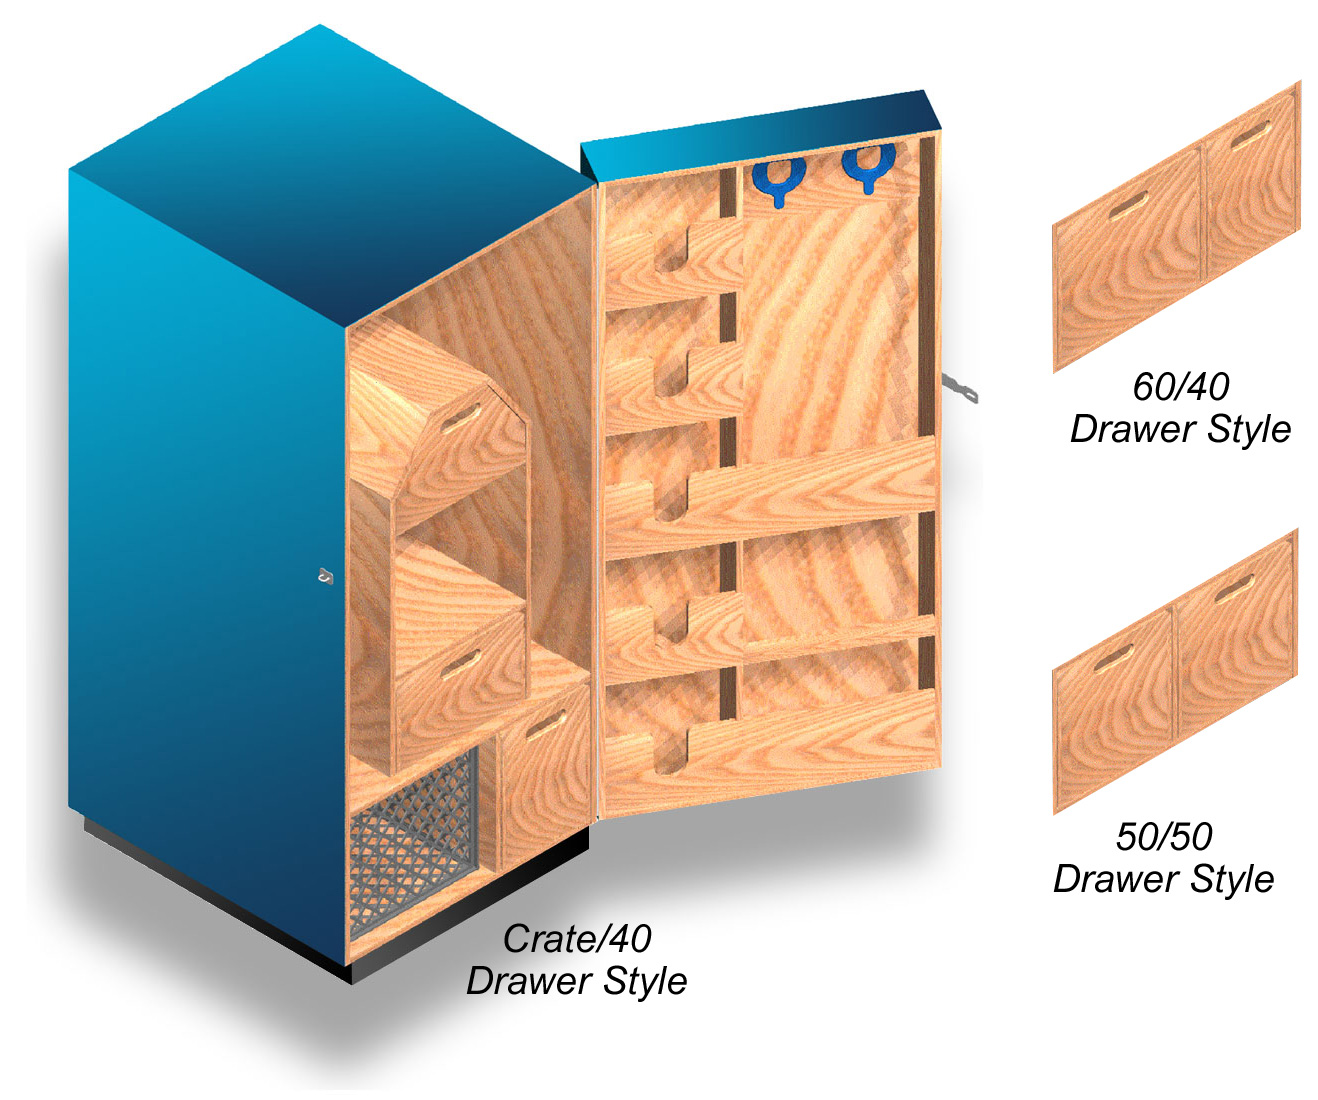 Elite Tack Design Western Tack Cabinet Low Cost Simple